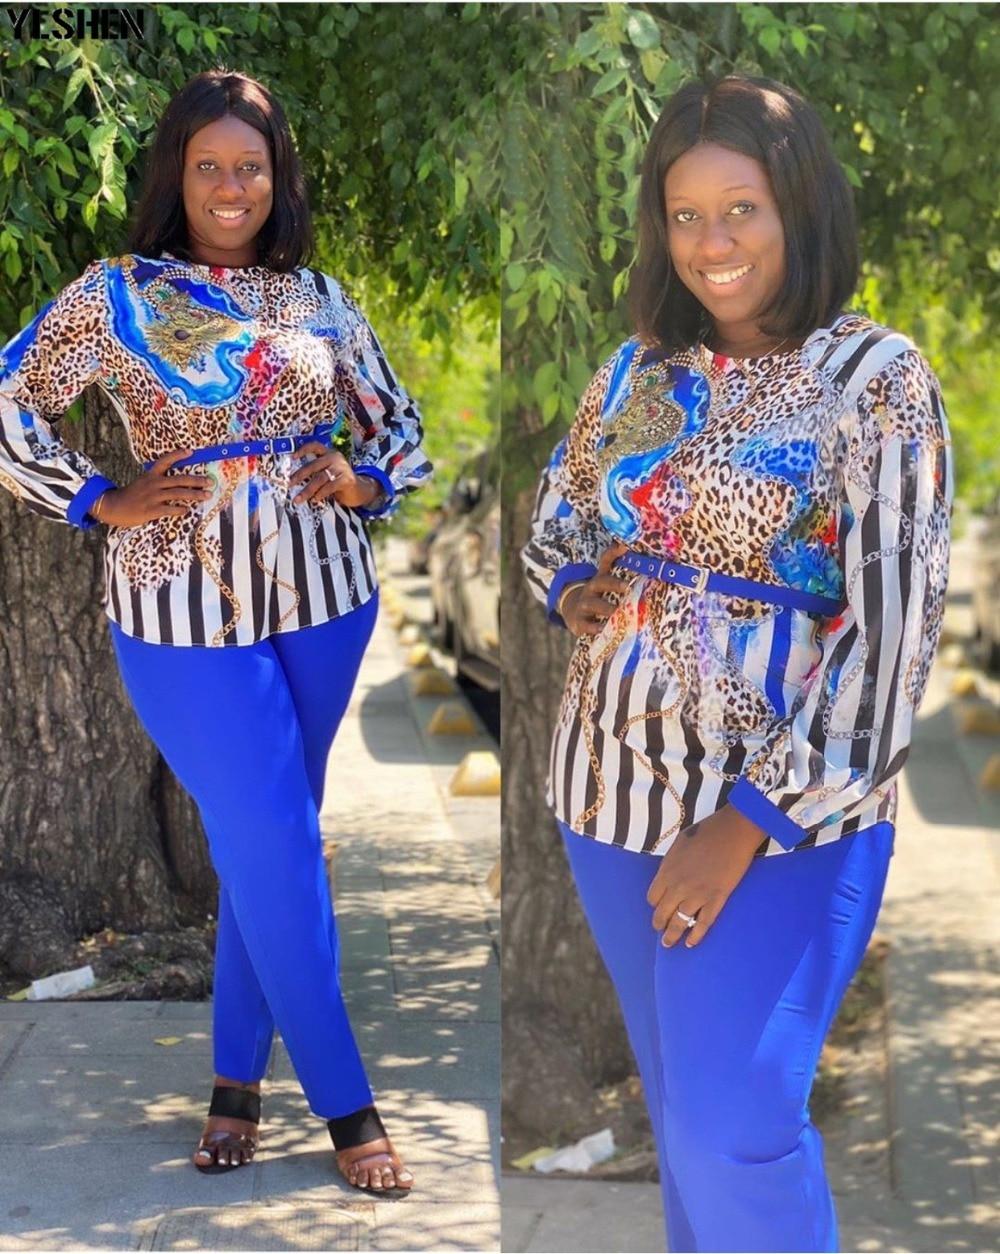 Two 2 Piece Set African Clothes Africa 2020 Dashiki Fashion Print Dresses Suit Bazin Top Pants Elastic Party Plus Size Clothing 11